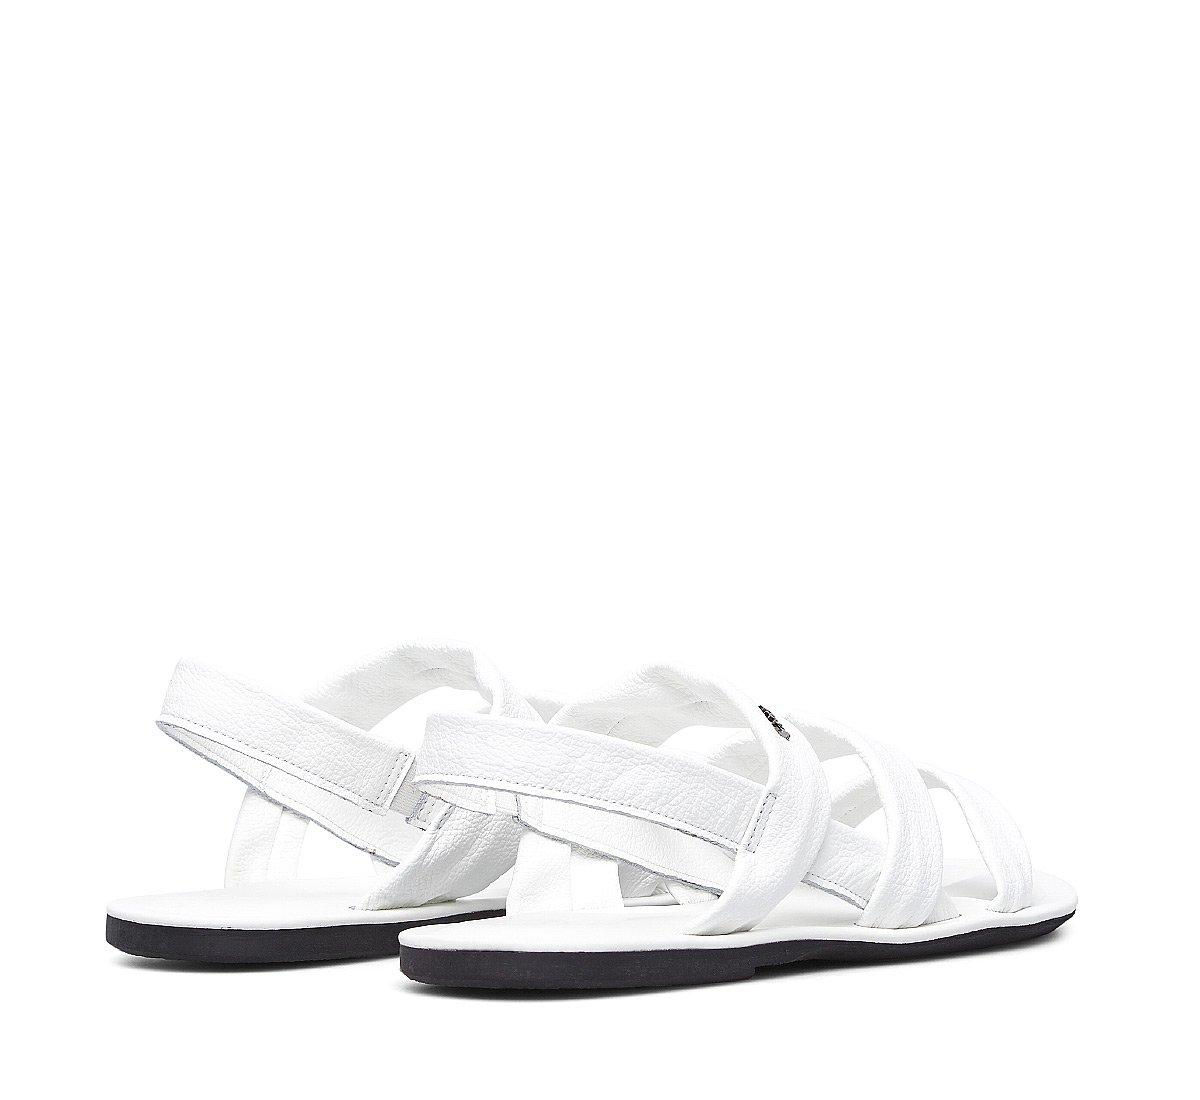 Soft nappa leather sandal